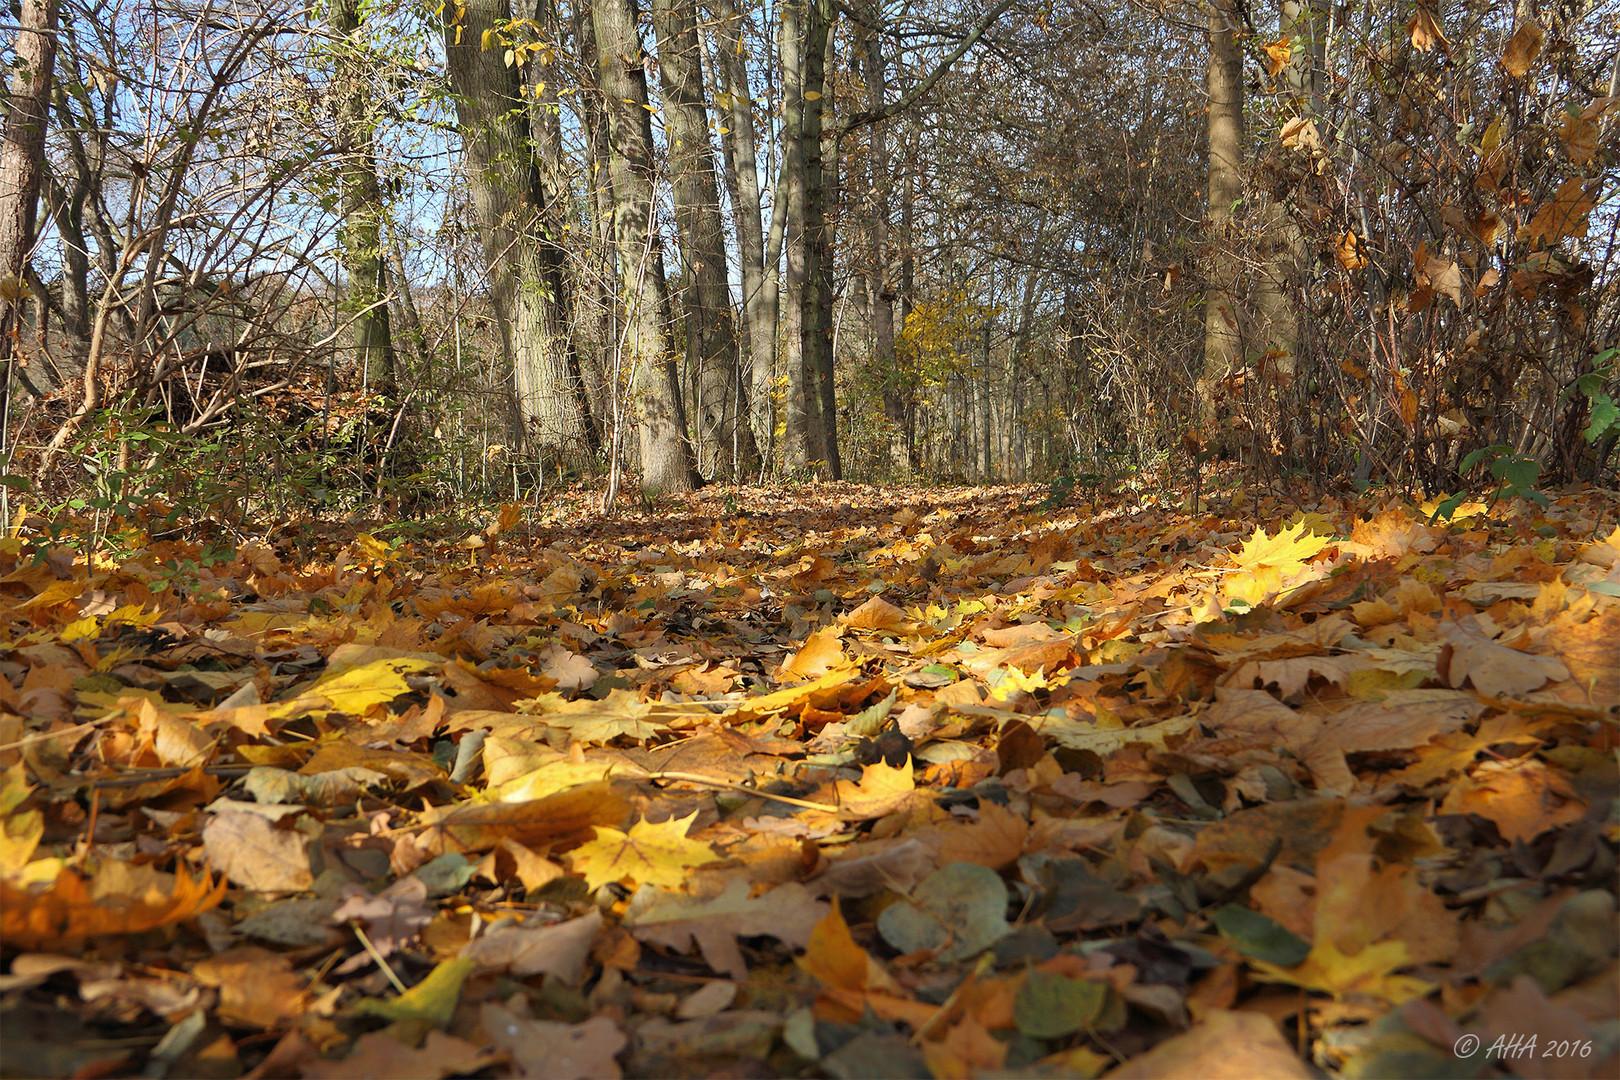 Analfick Im Herbstlaub